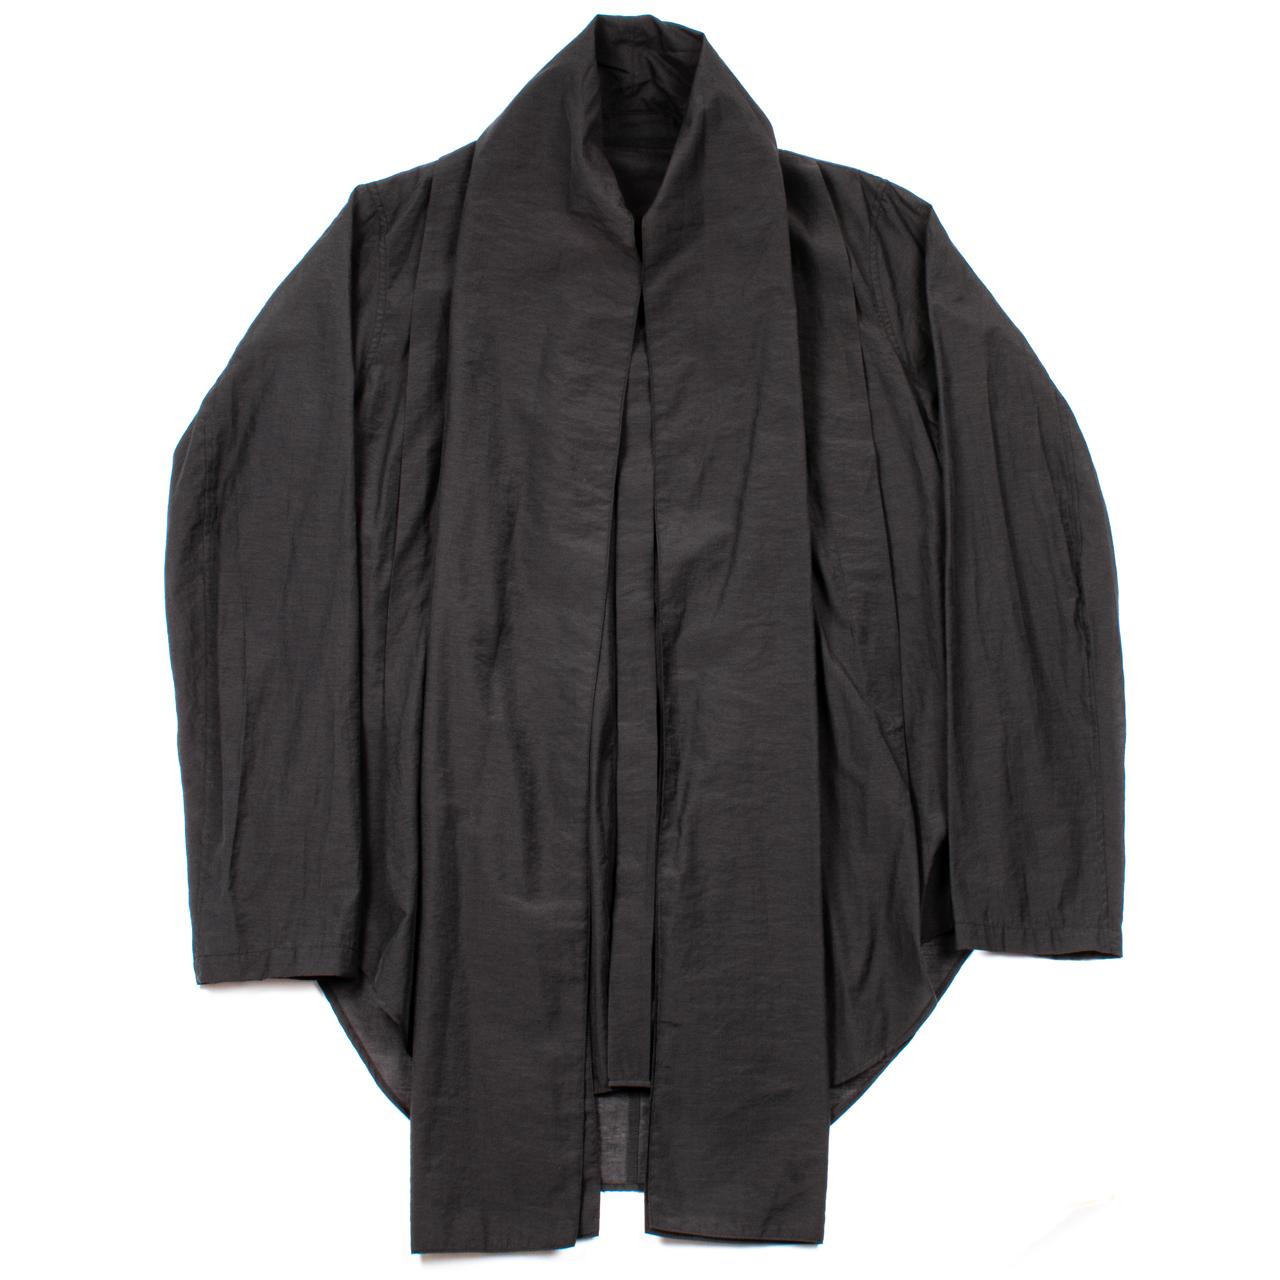 717SHM2-BLACK / スカーフカラーシャツ